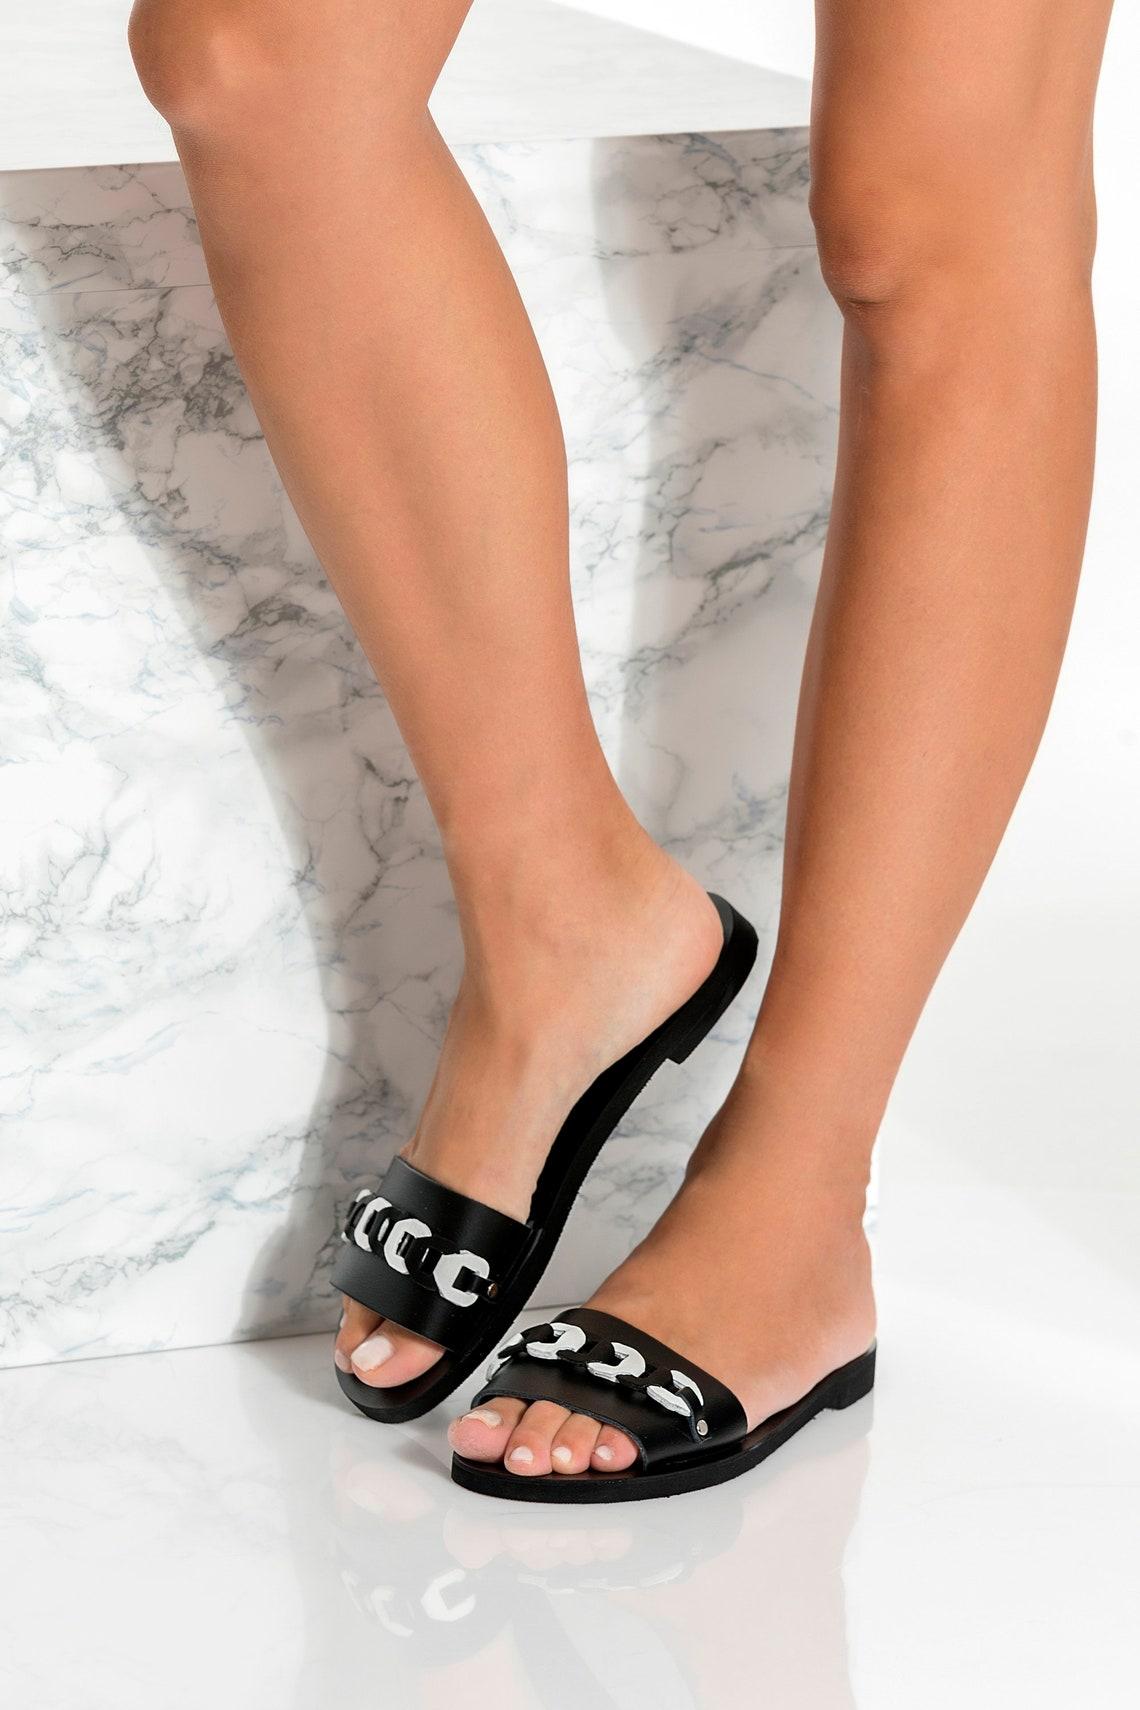 Greek Sandals for Women, Black Sandals, Handmade Leather Sandals, Boho Sandals, Slip on Sandals, Open Toe Slides, Ekavi design